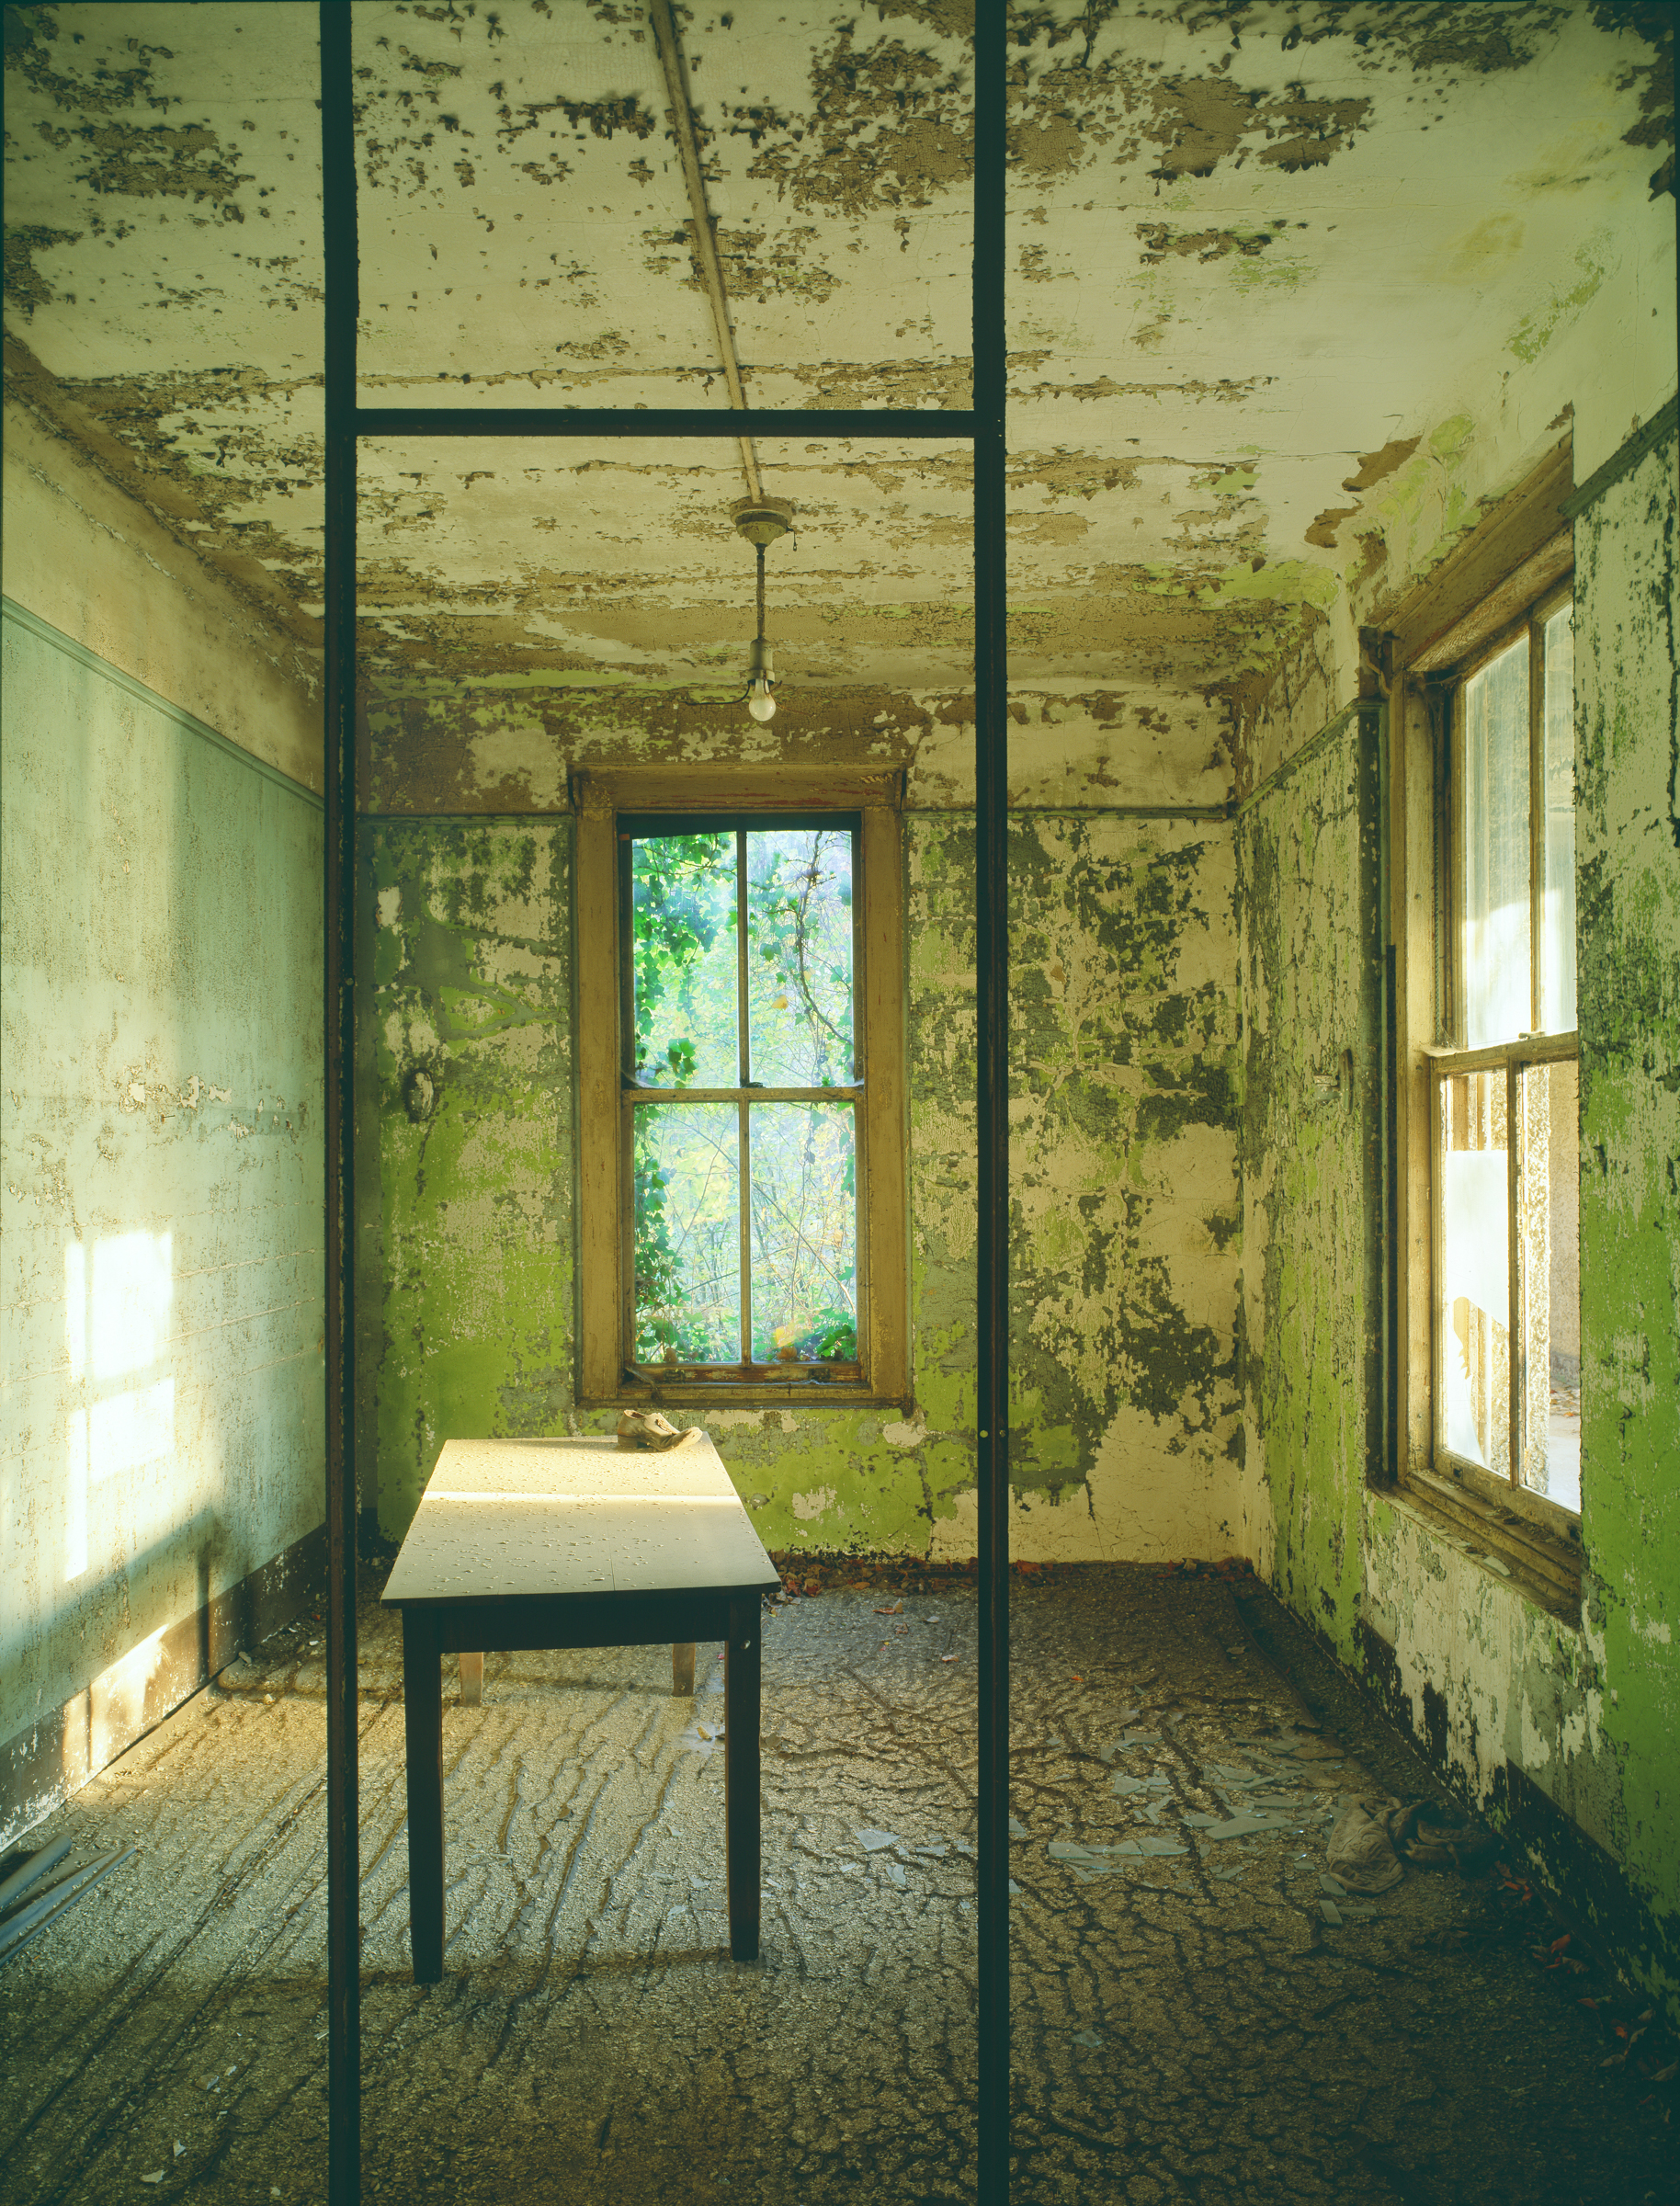 Ellis Island: Administration office, single shoe, Island 3 © Stephen Wilkes